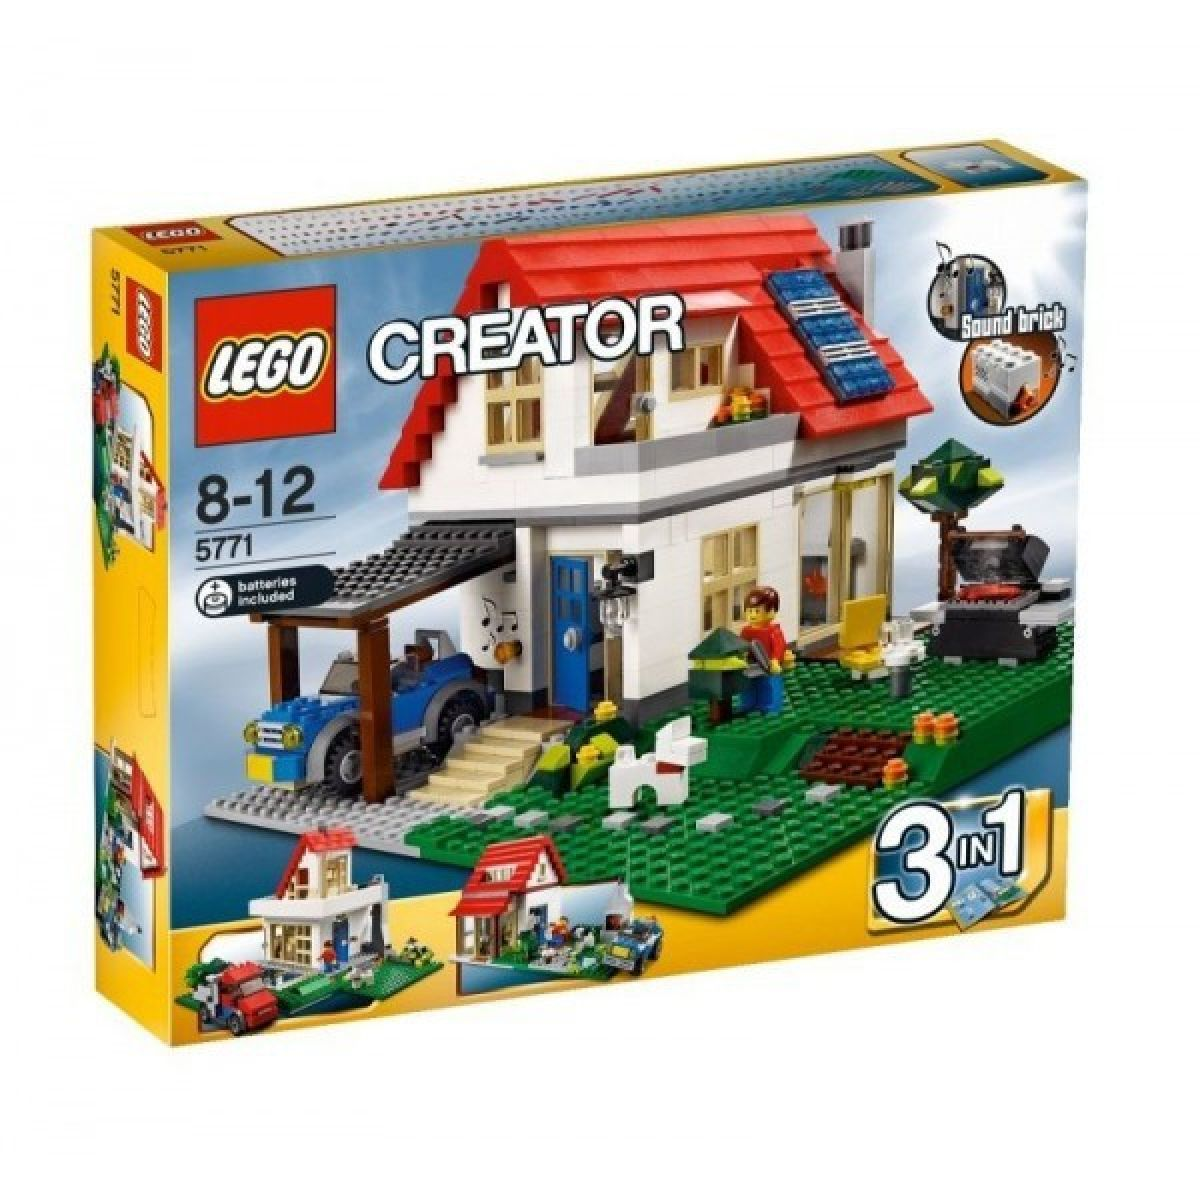 LEGO CREATOR 5771 Chalupa